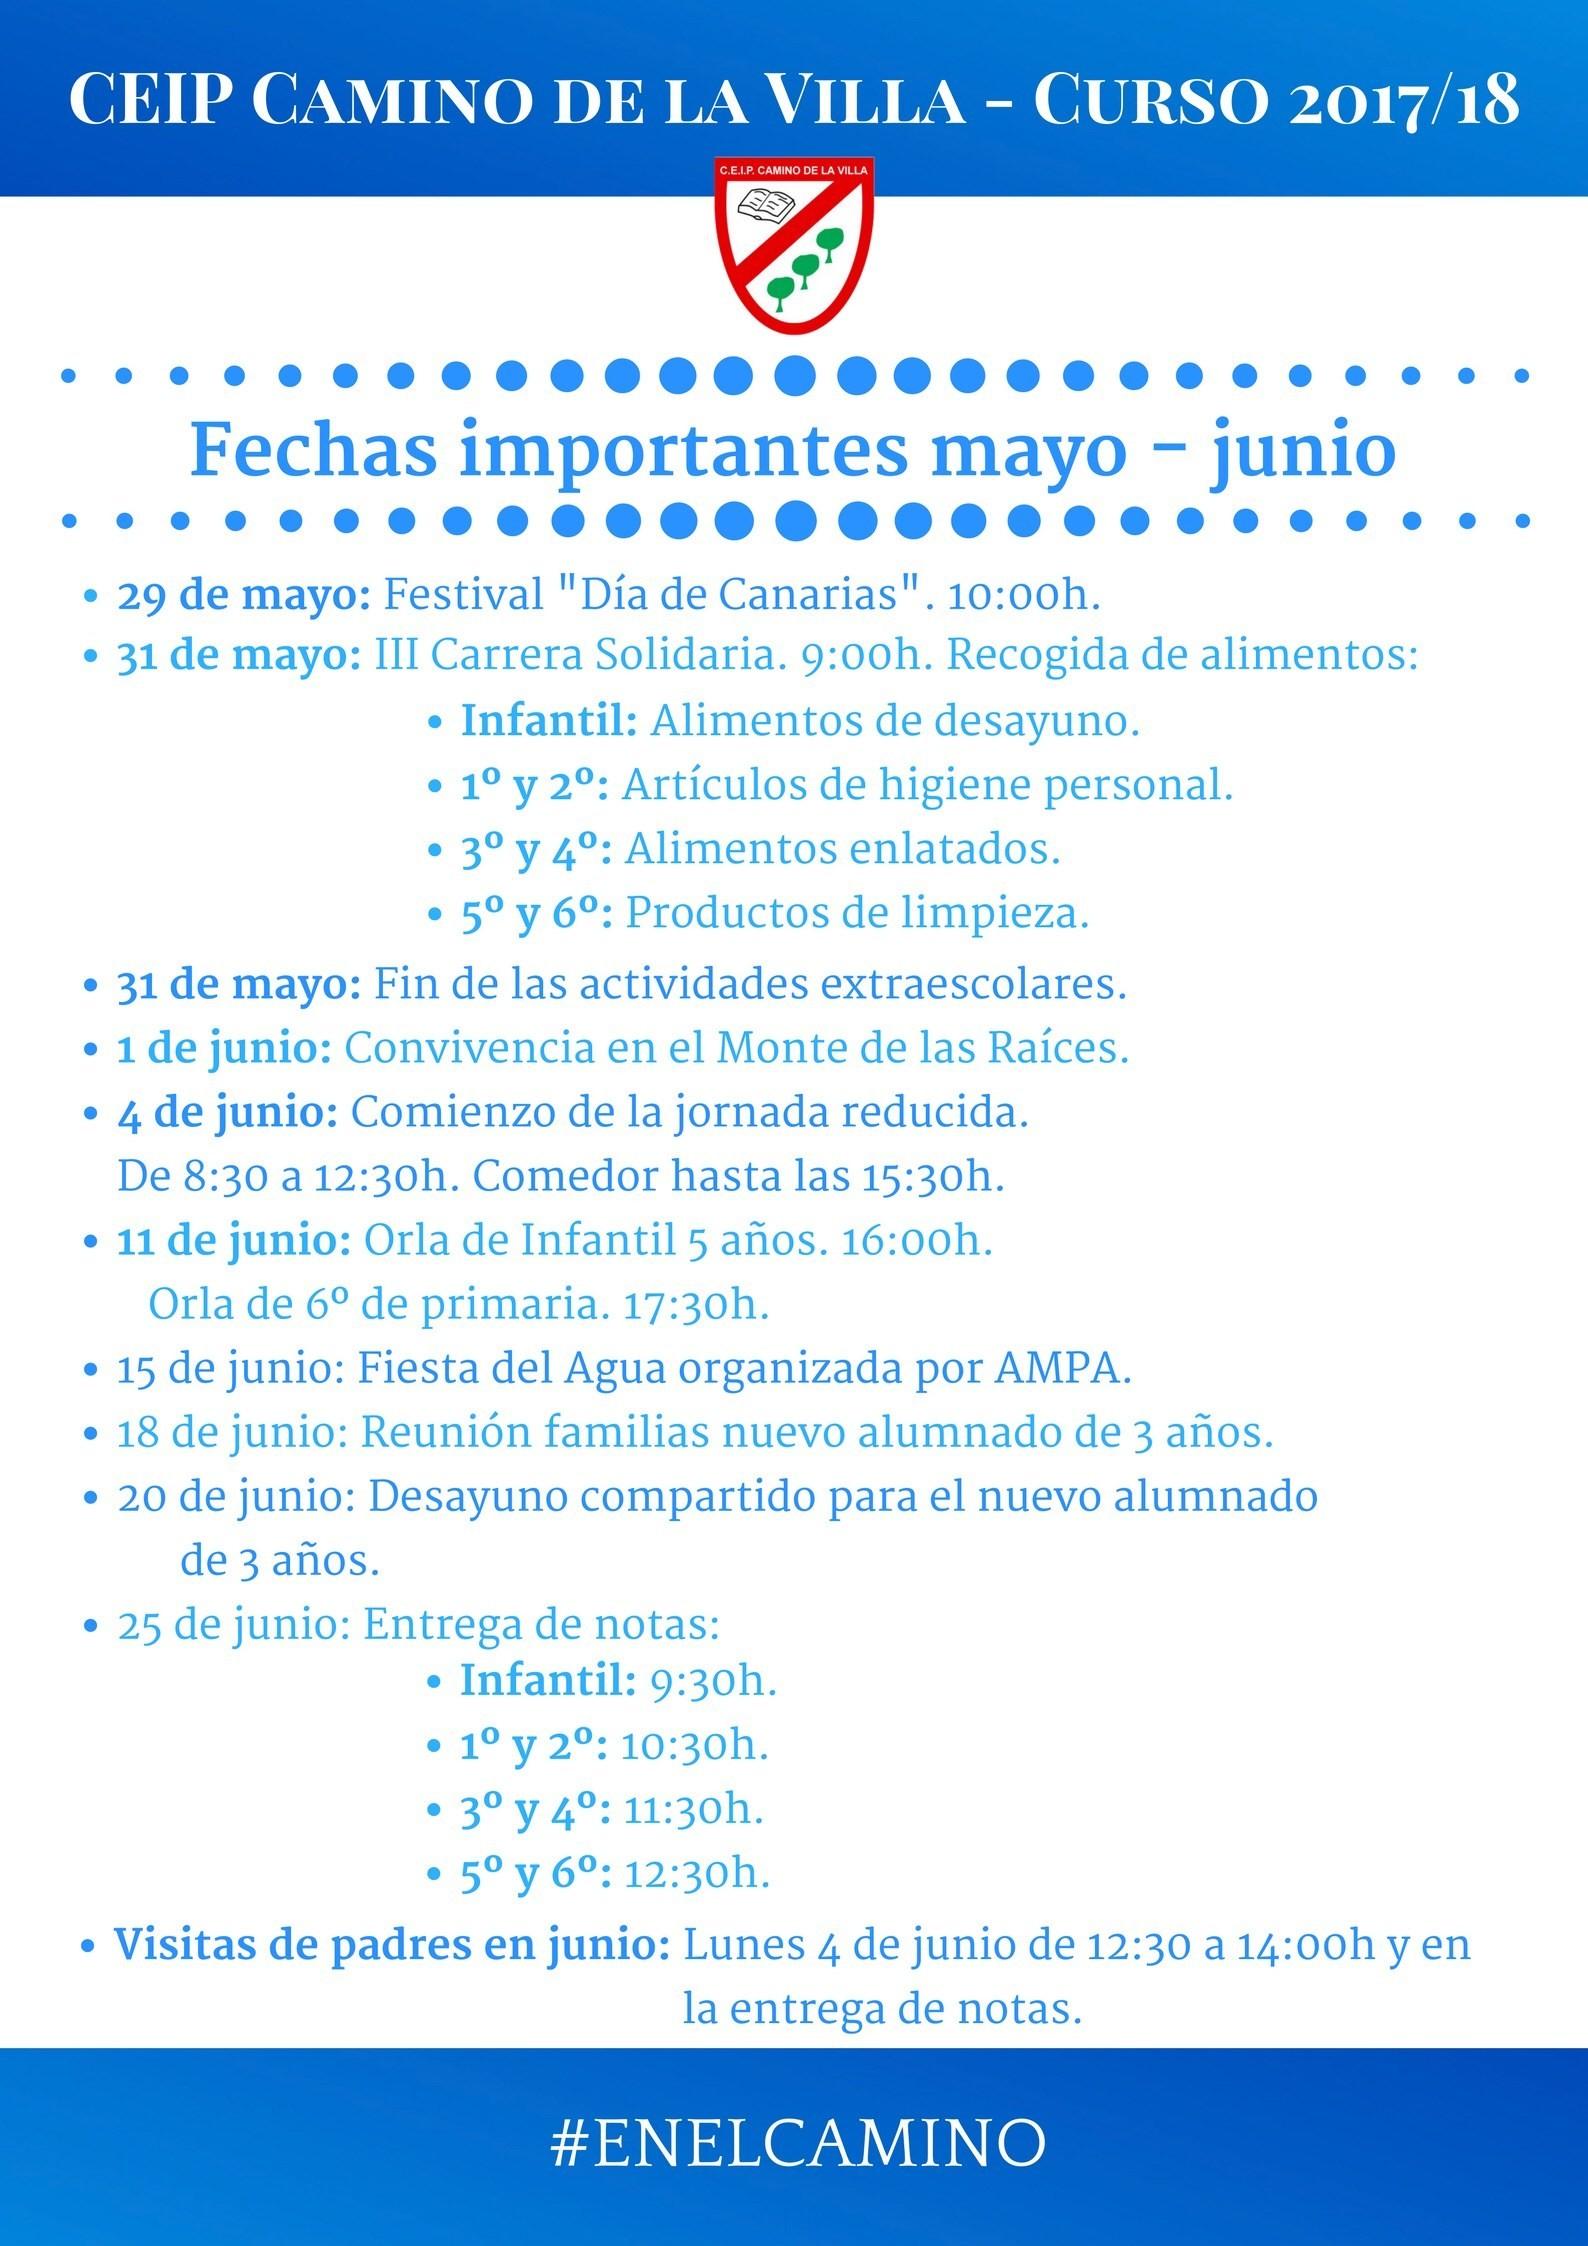 Calendario Escolar 2019 Ourense Más Caliente Fechas De Junio Of Calendario Escolar 2019 Ourense Más Caliente Fechas De Junio